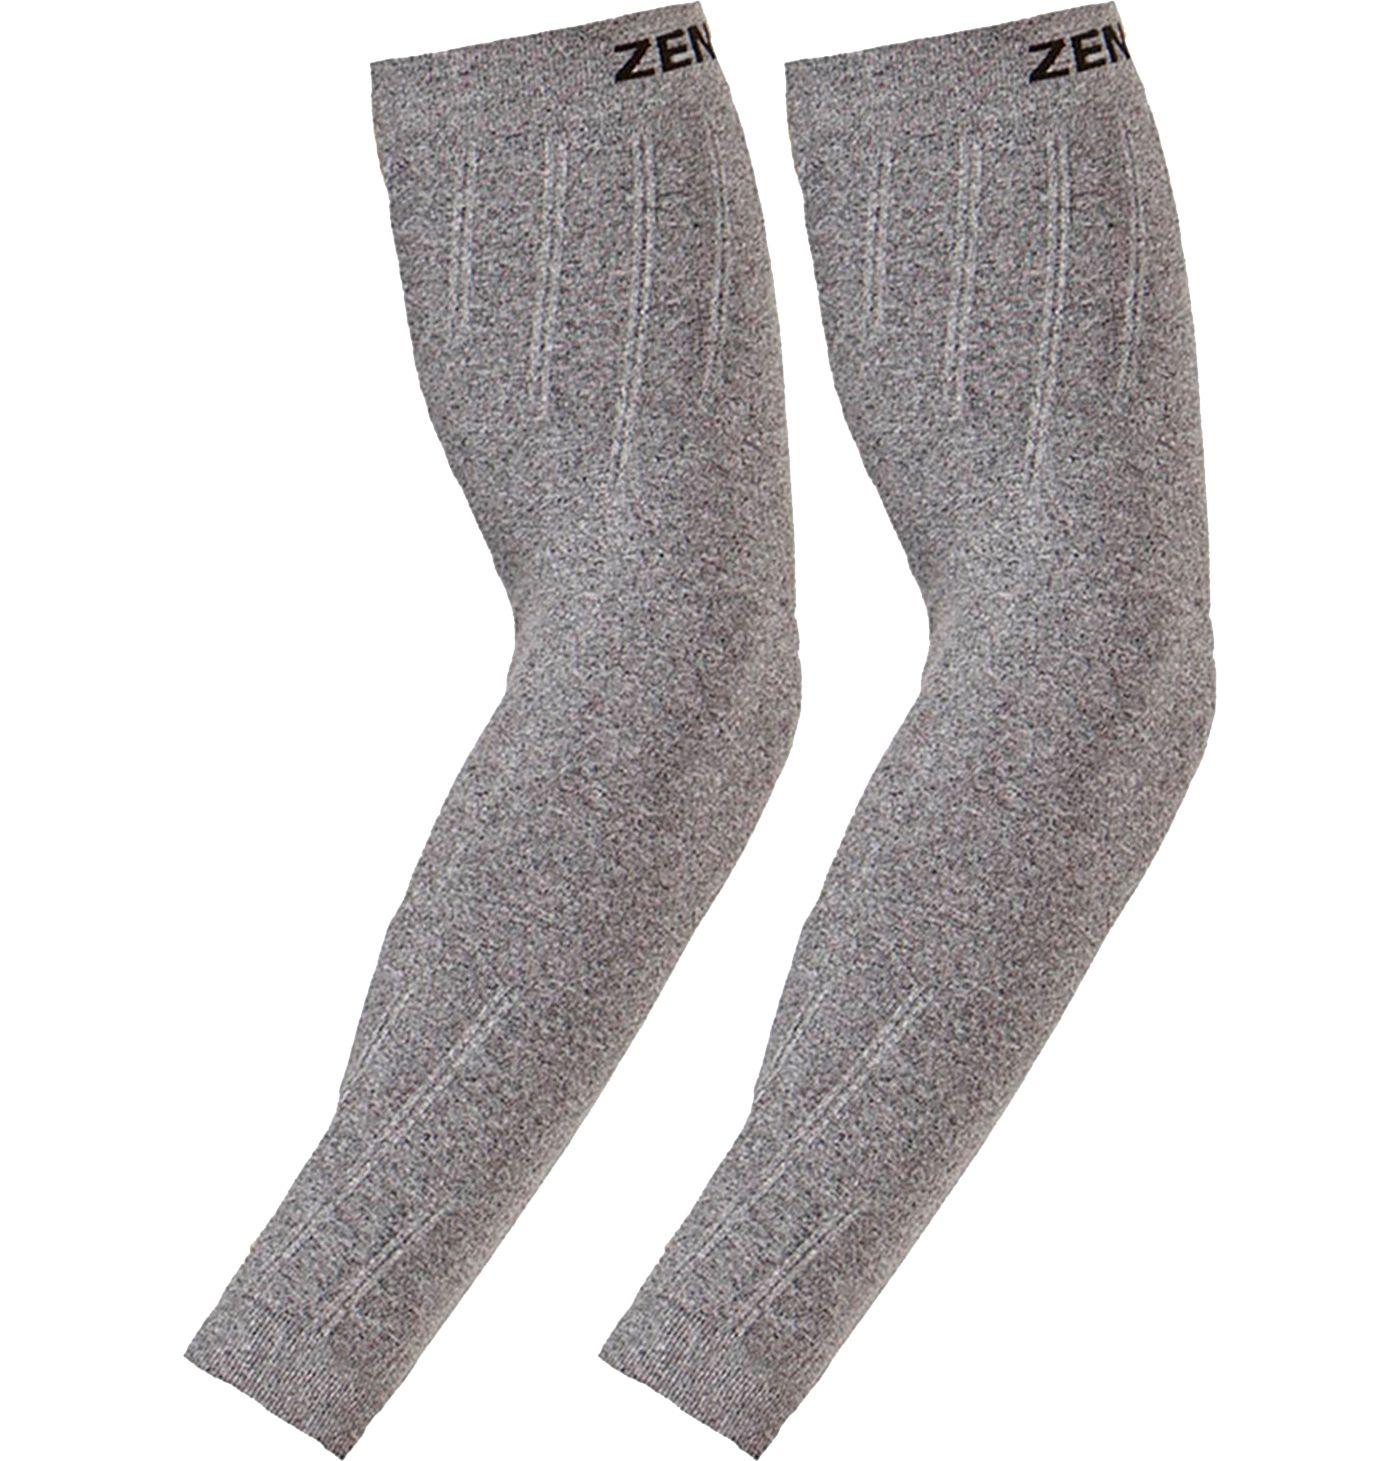 Zensah Compression Arm Sleeves